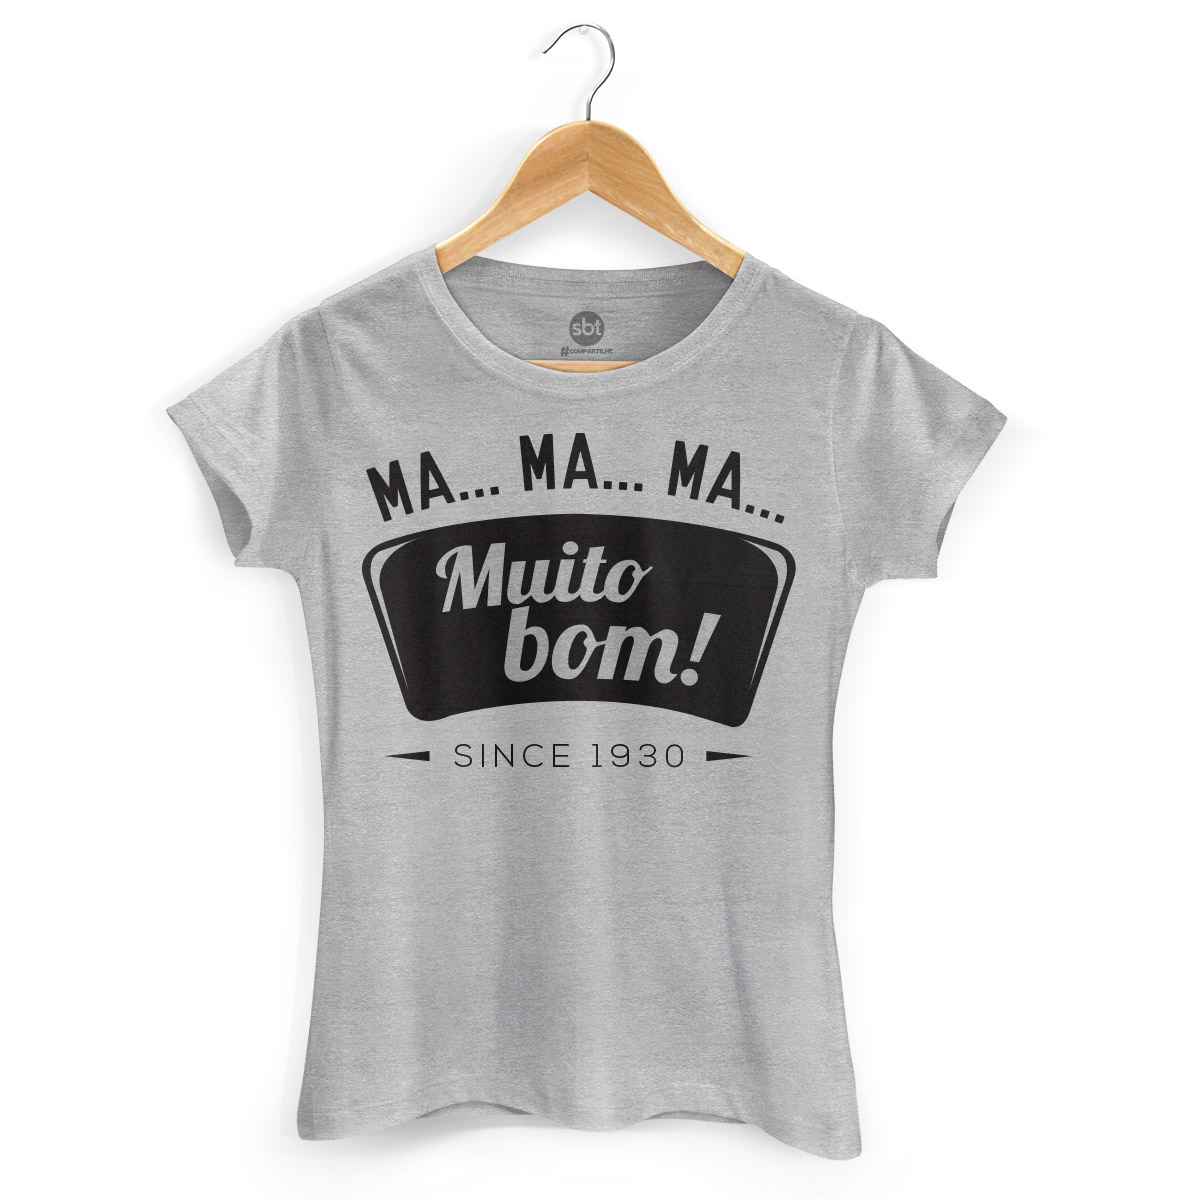 Camiseta Feminina SBT Muito Bom!